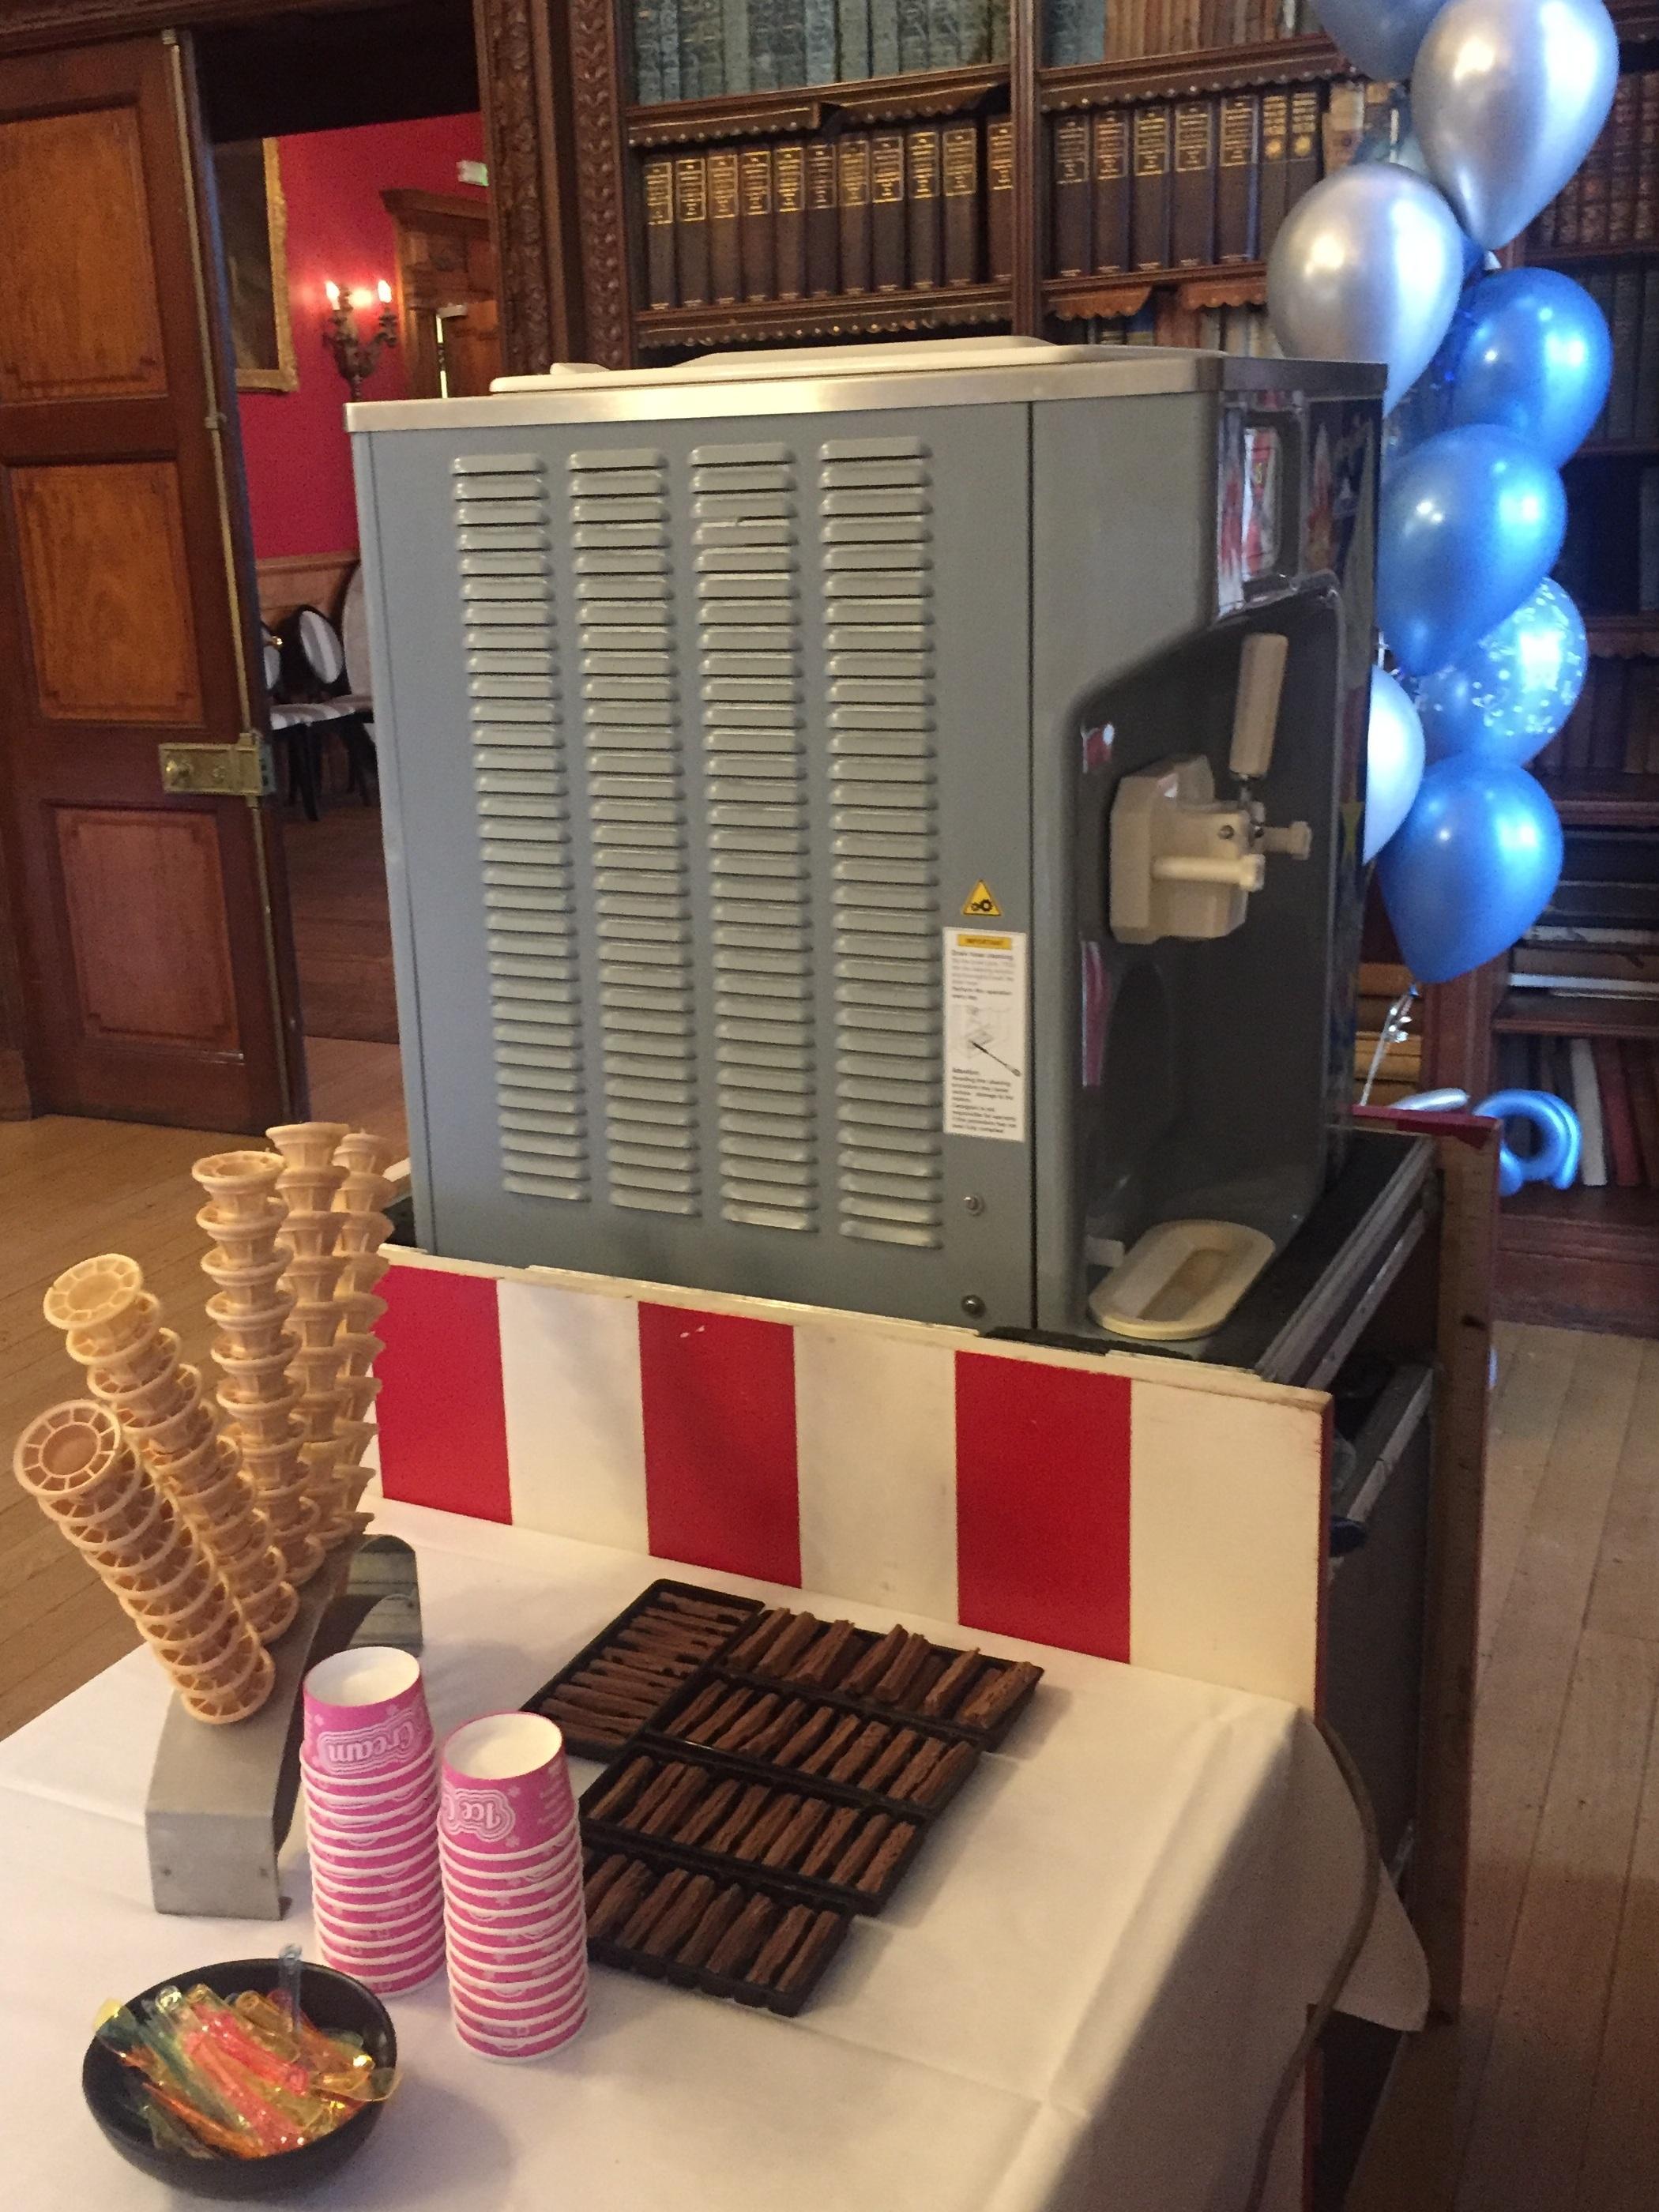 Ice Cream machine at Boutique Hotel chain